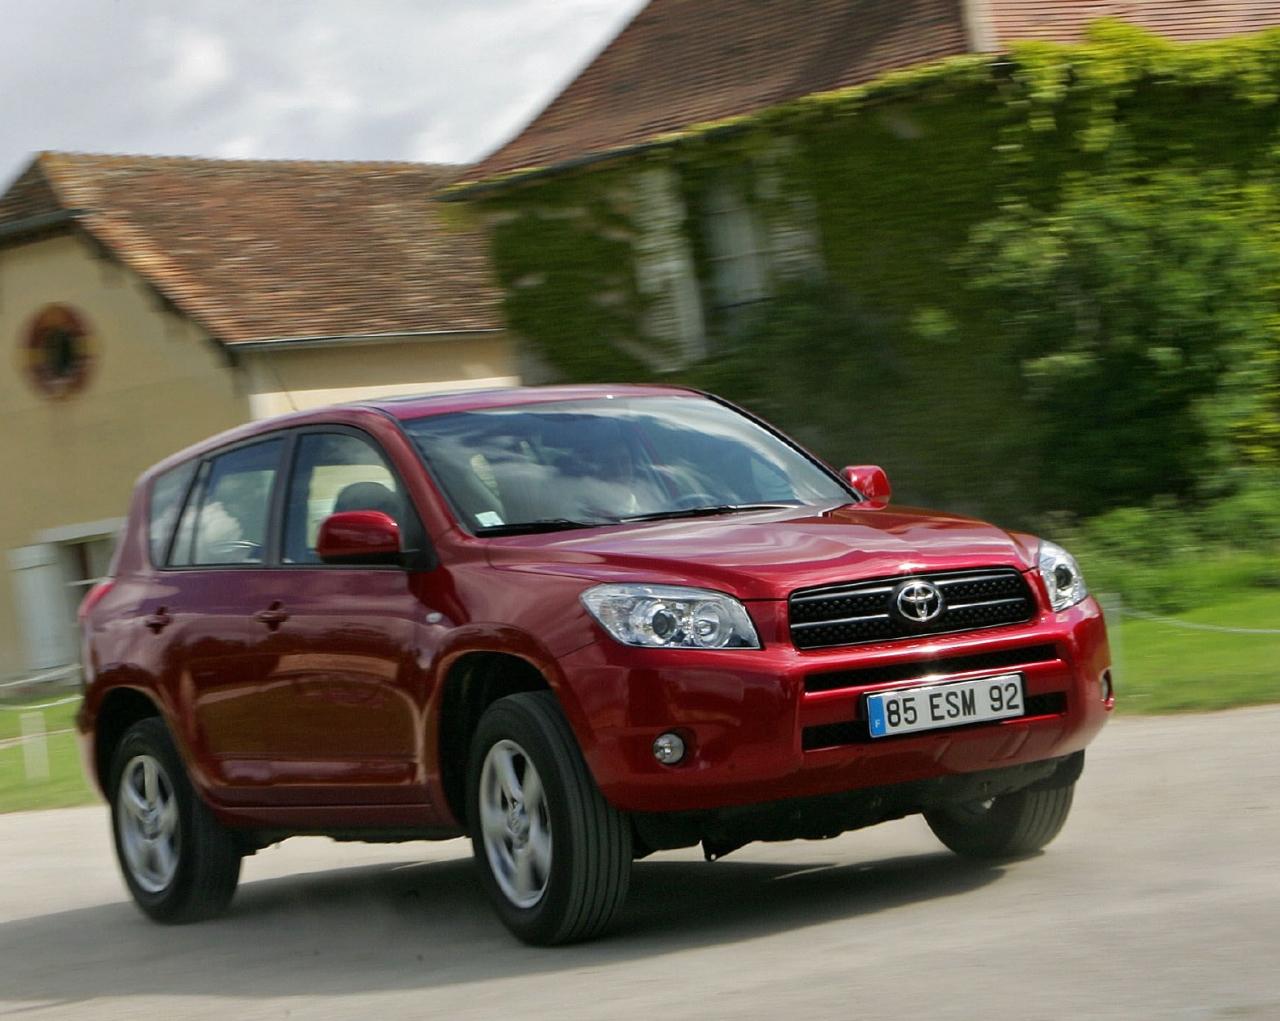 Voiture d'occasion : quel Toyota RAV4 acheter ? - L'argus